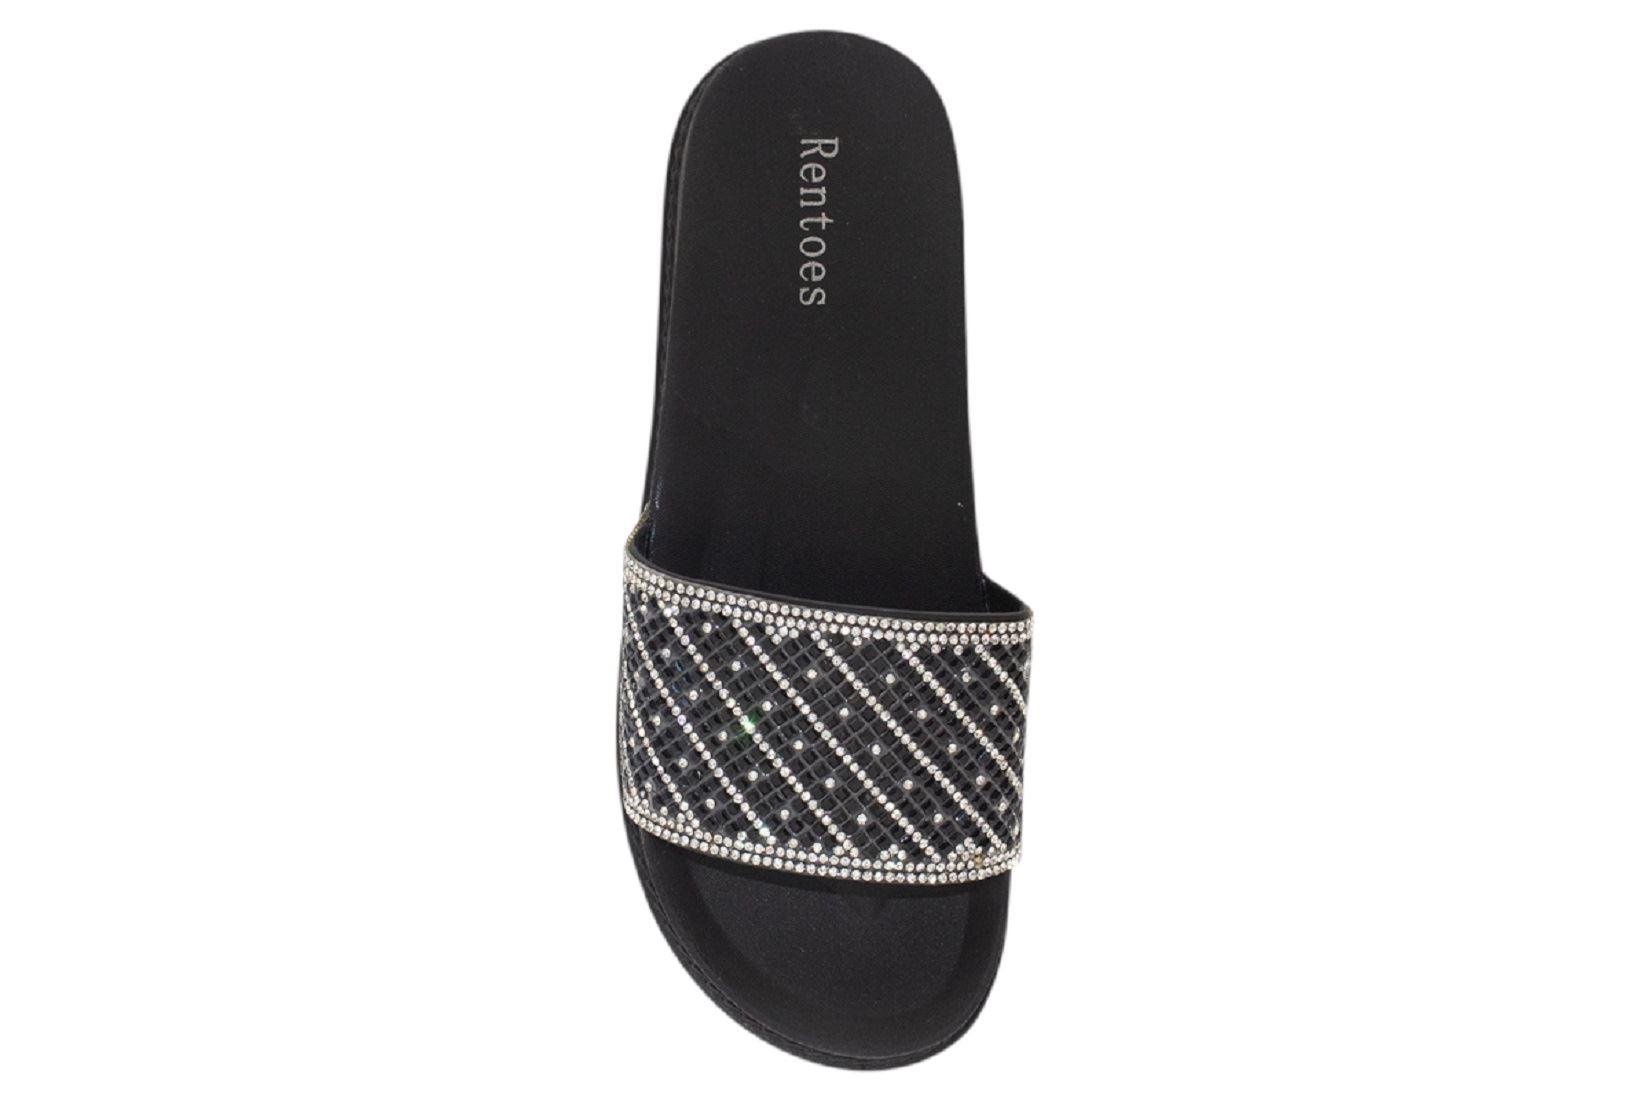 Womens-Sliders-Casual-Slippers-Mules-Ladies-Diamante-Flip-Flop-Sandals-Shoes thumbnail 24